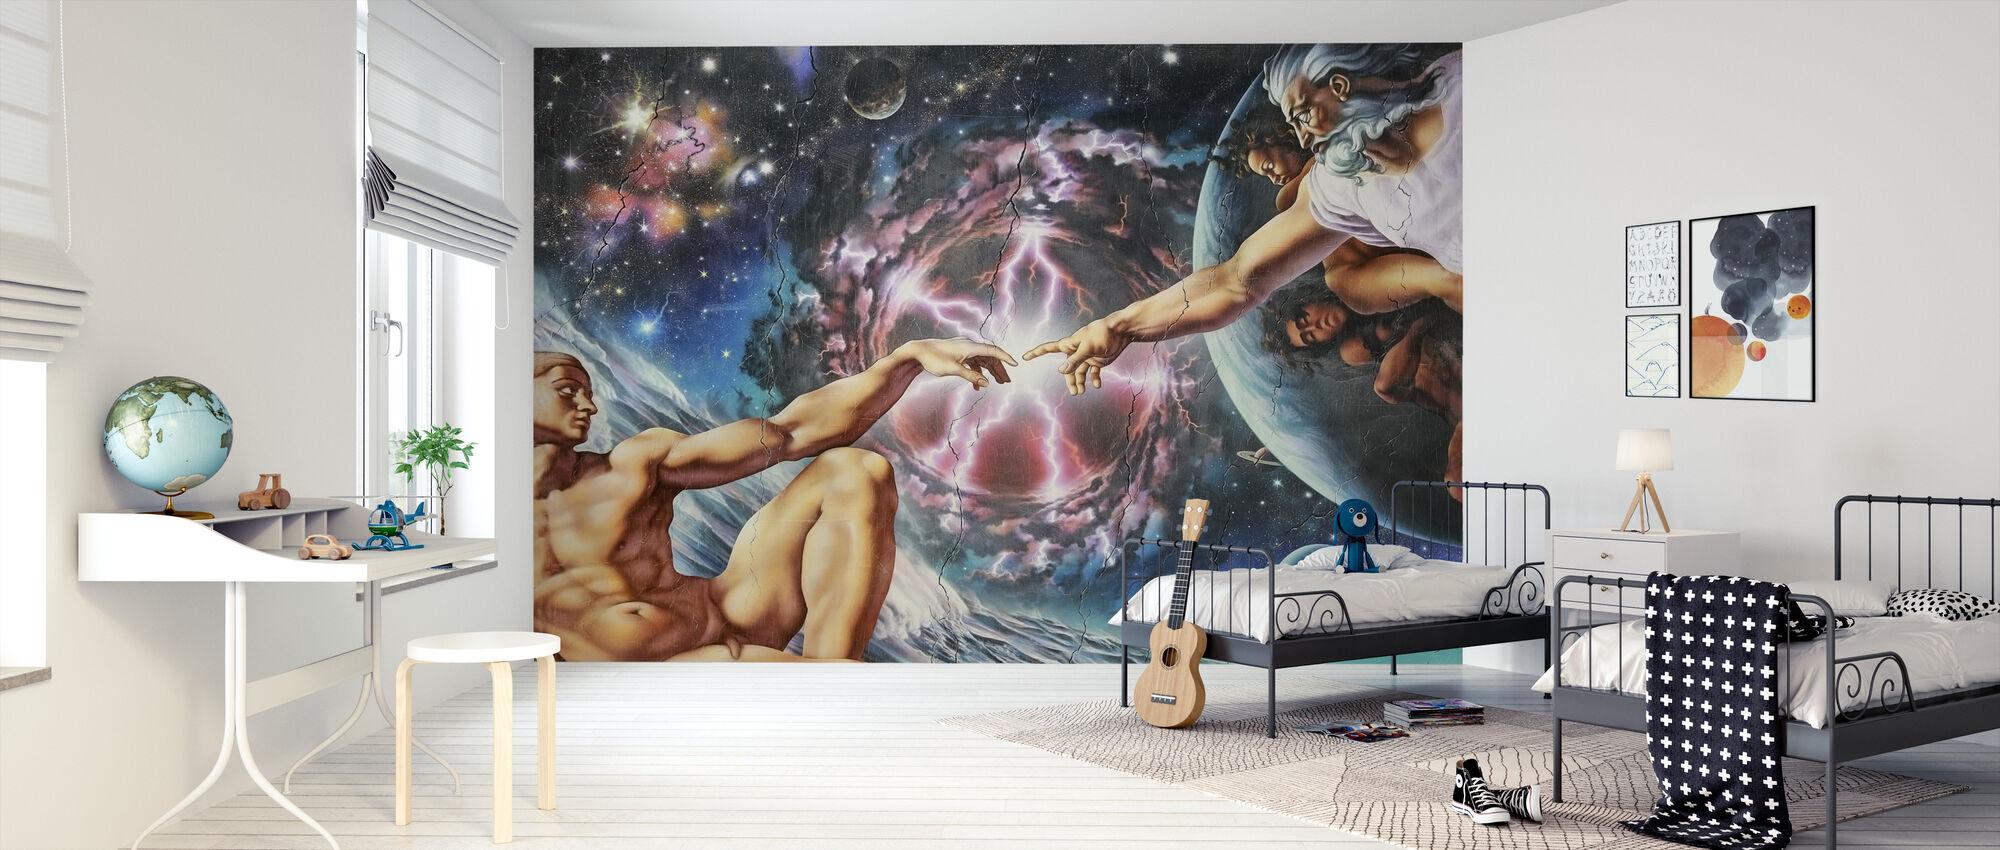 Creation - Wallpaper - Kids Room